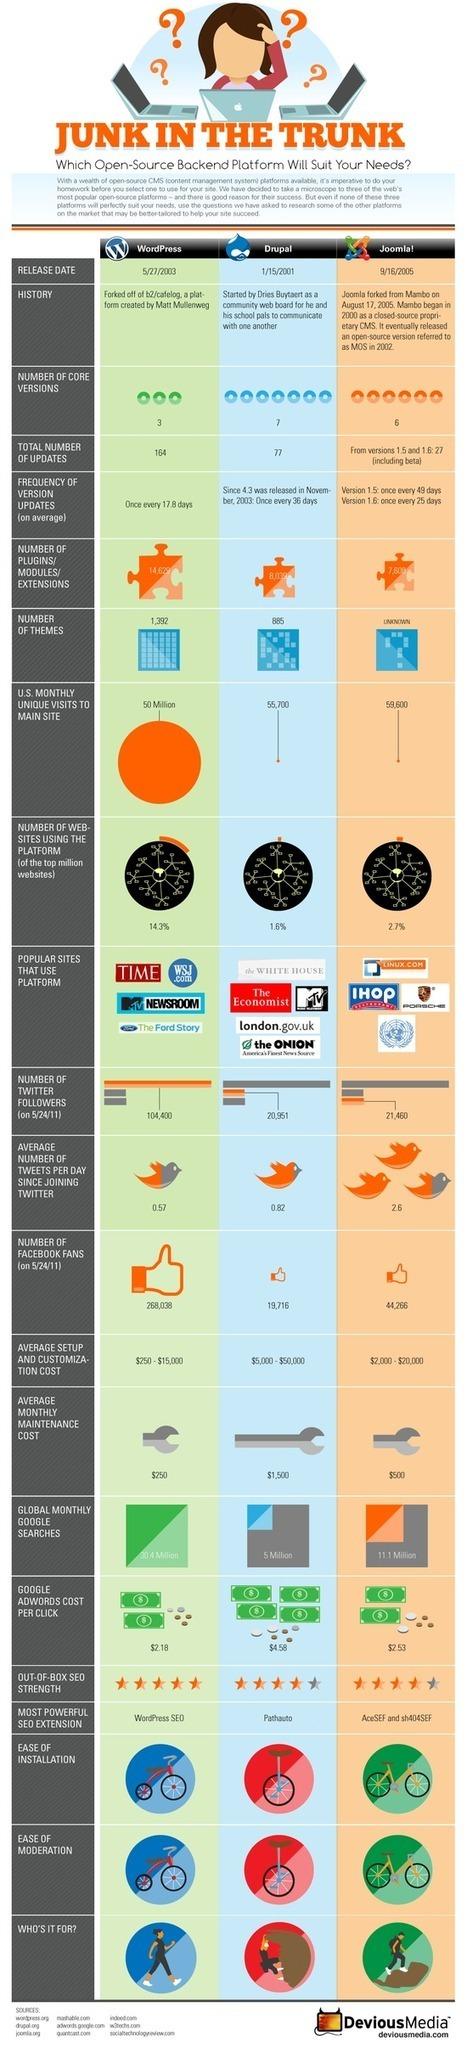 WordPress vs Joomla vs Drupal - CMS Popularity War | Technology and Education | Scoop.it